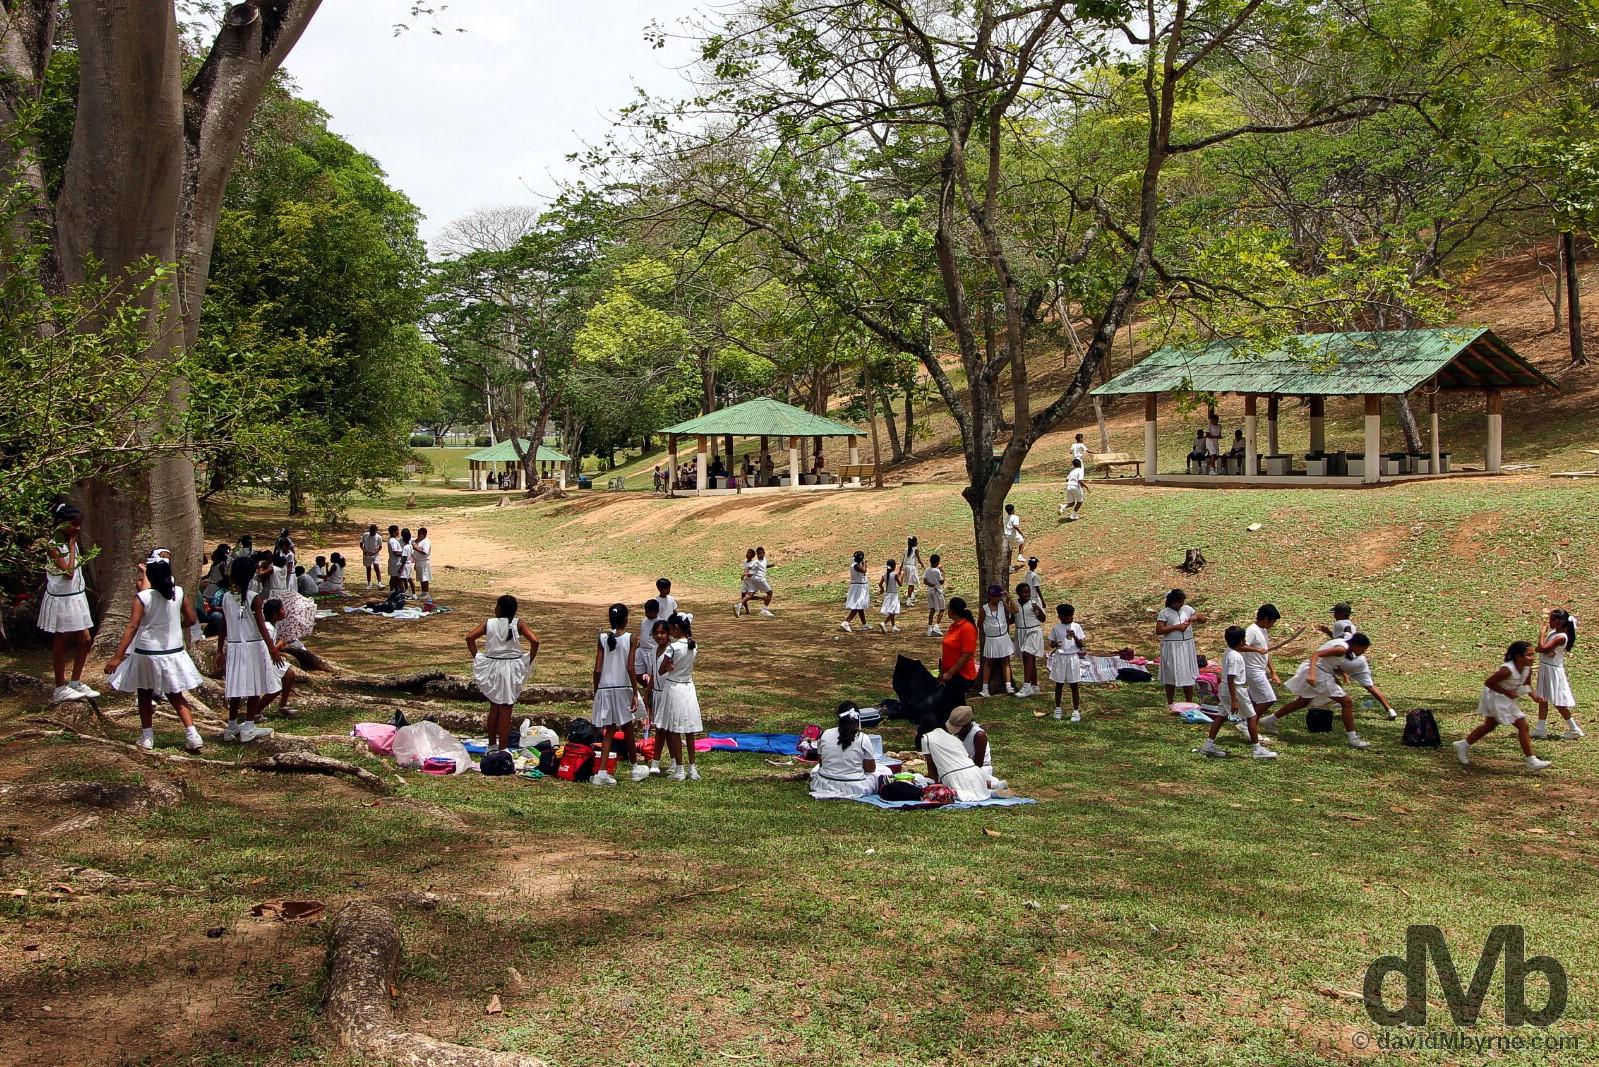 Botanical Gardens, Port of Spain, Trinidad & Tobago. June 17, 2015.